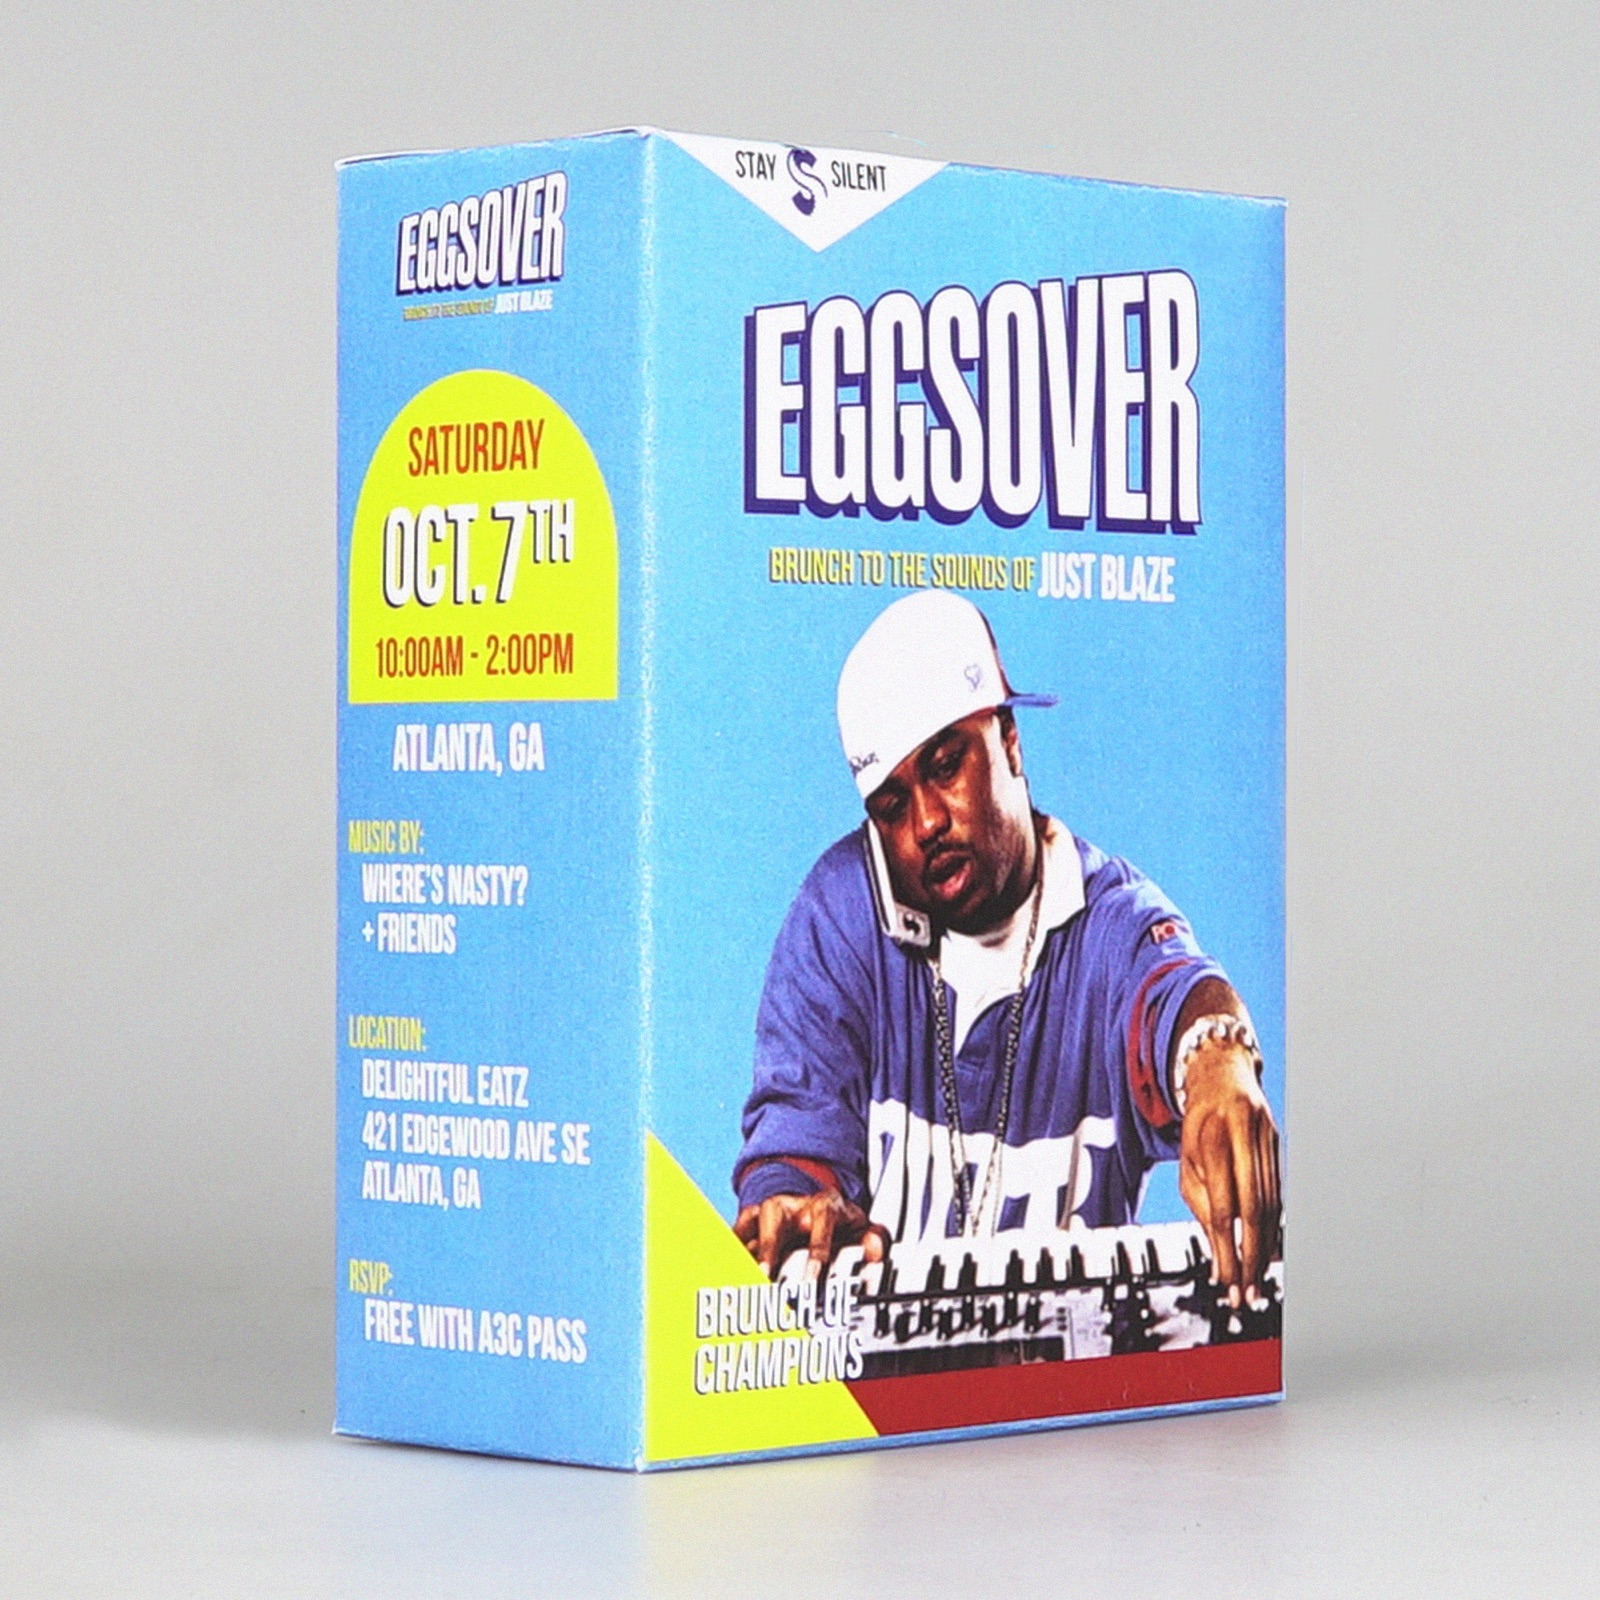 EGGSOVER-JUST-BLAZE - where's nasty.jpg